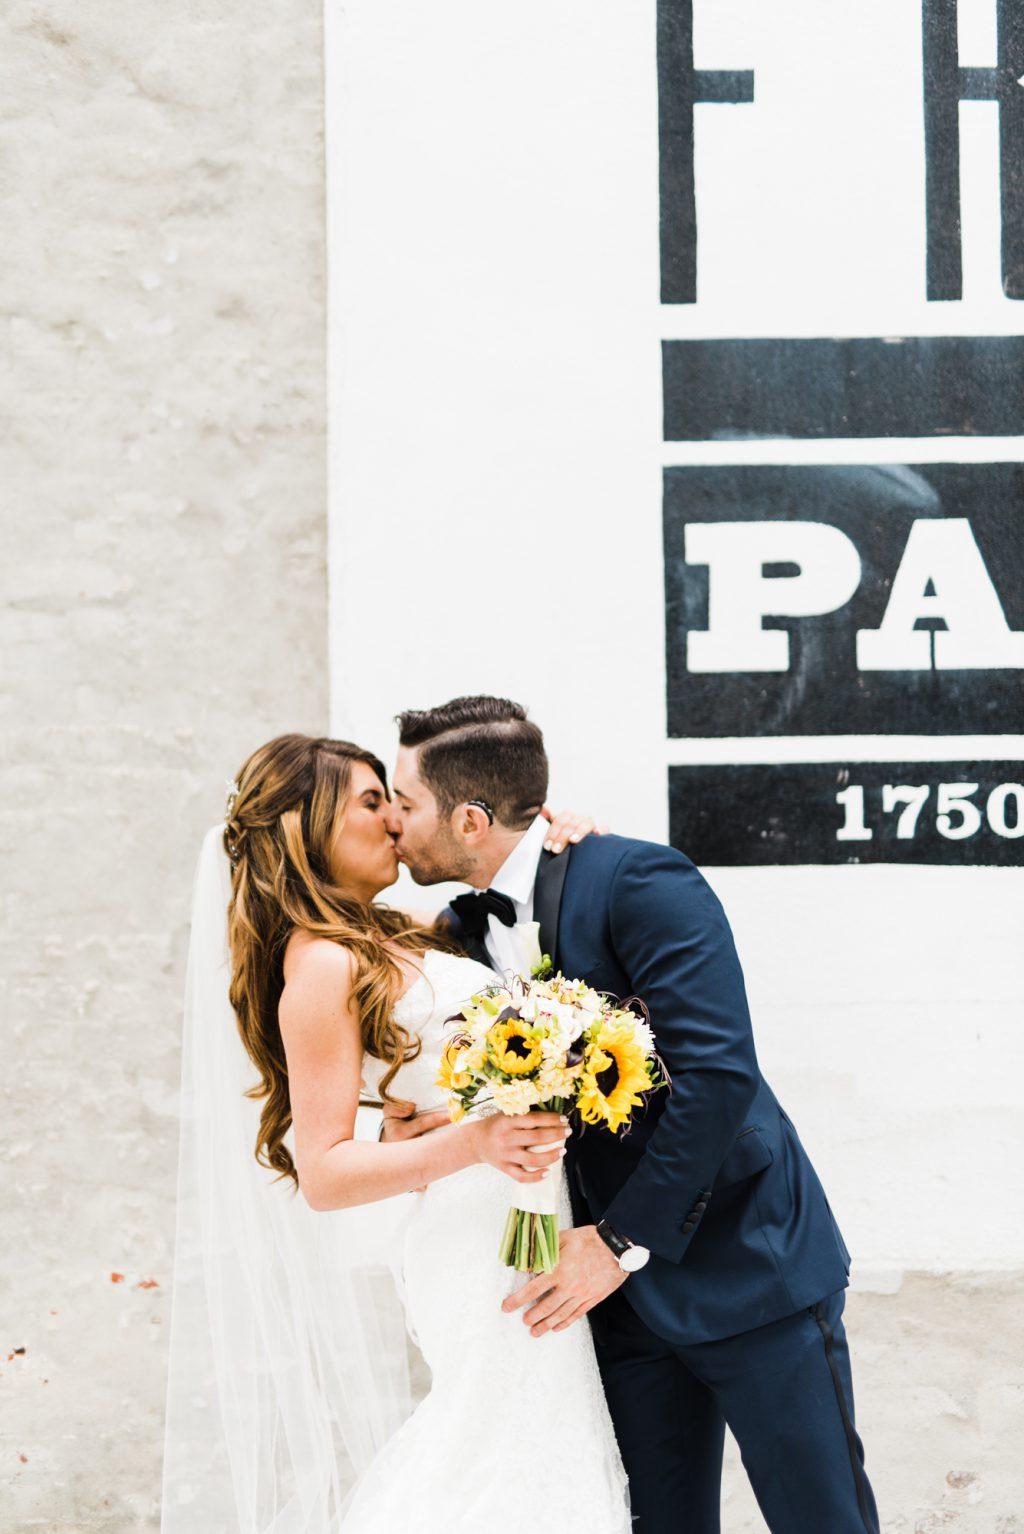 haleyrichterphoto-front-and-palmer-spring-wedding-rodin-museum-loews-hotel-philadelphia-109